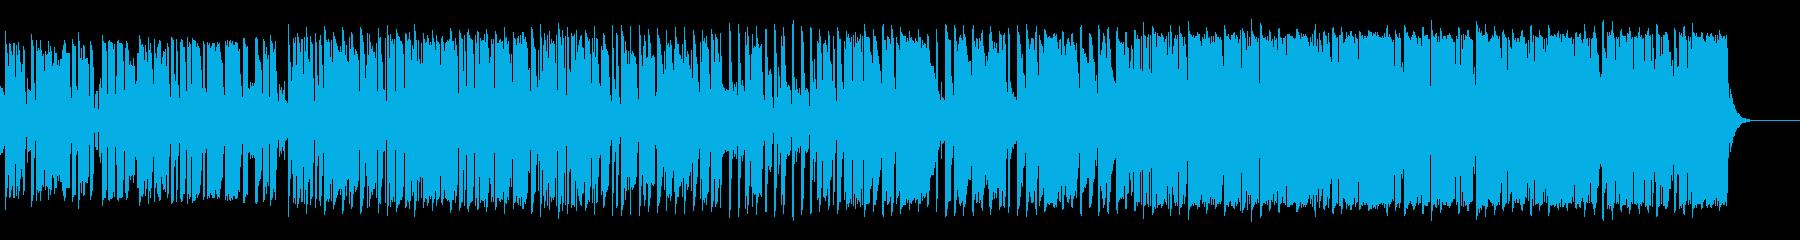 jazz track 01の再生済みの波形